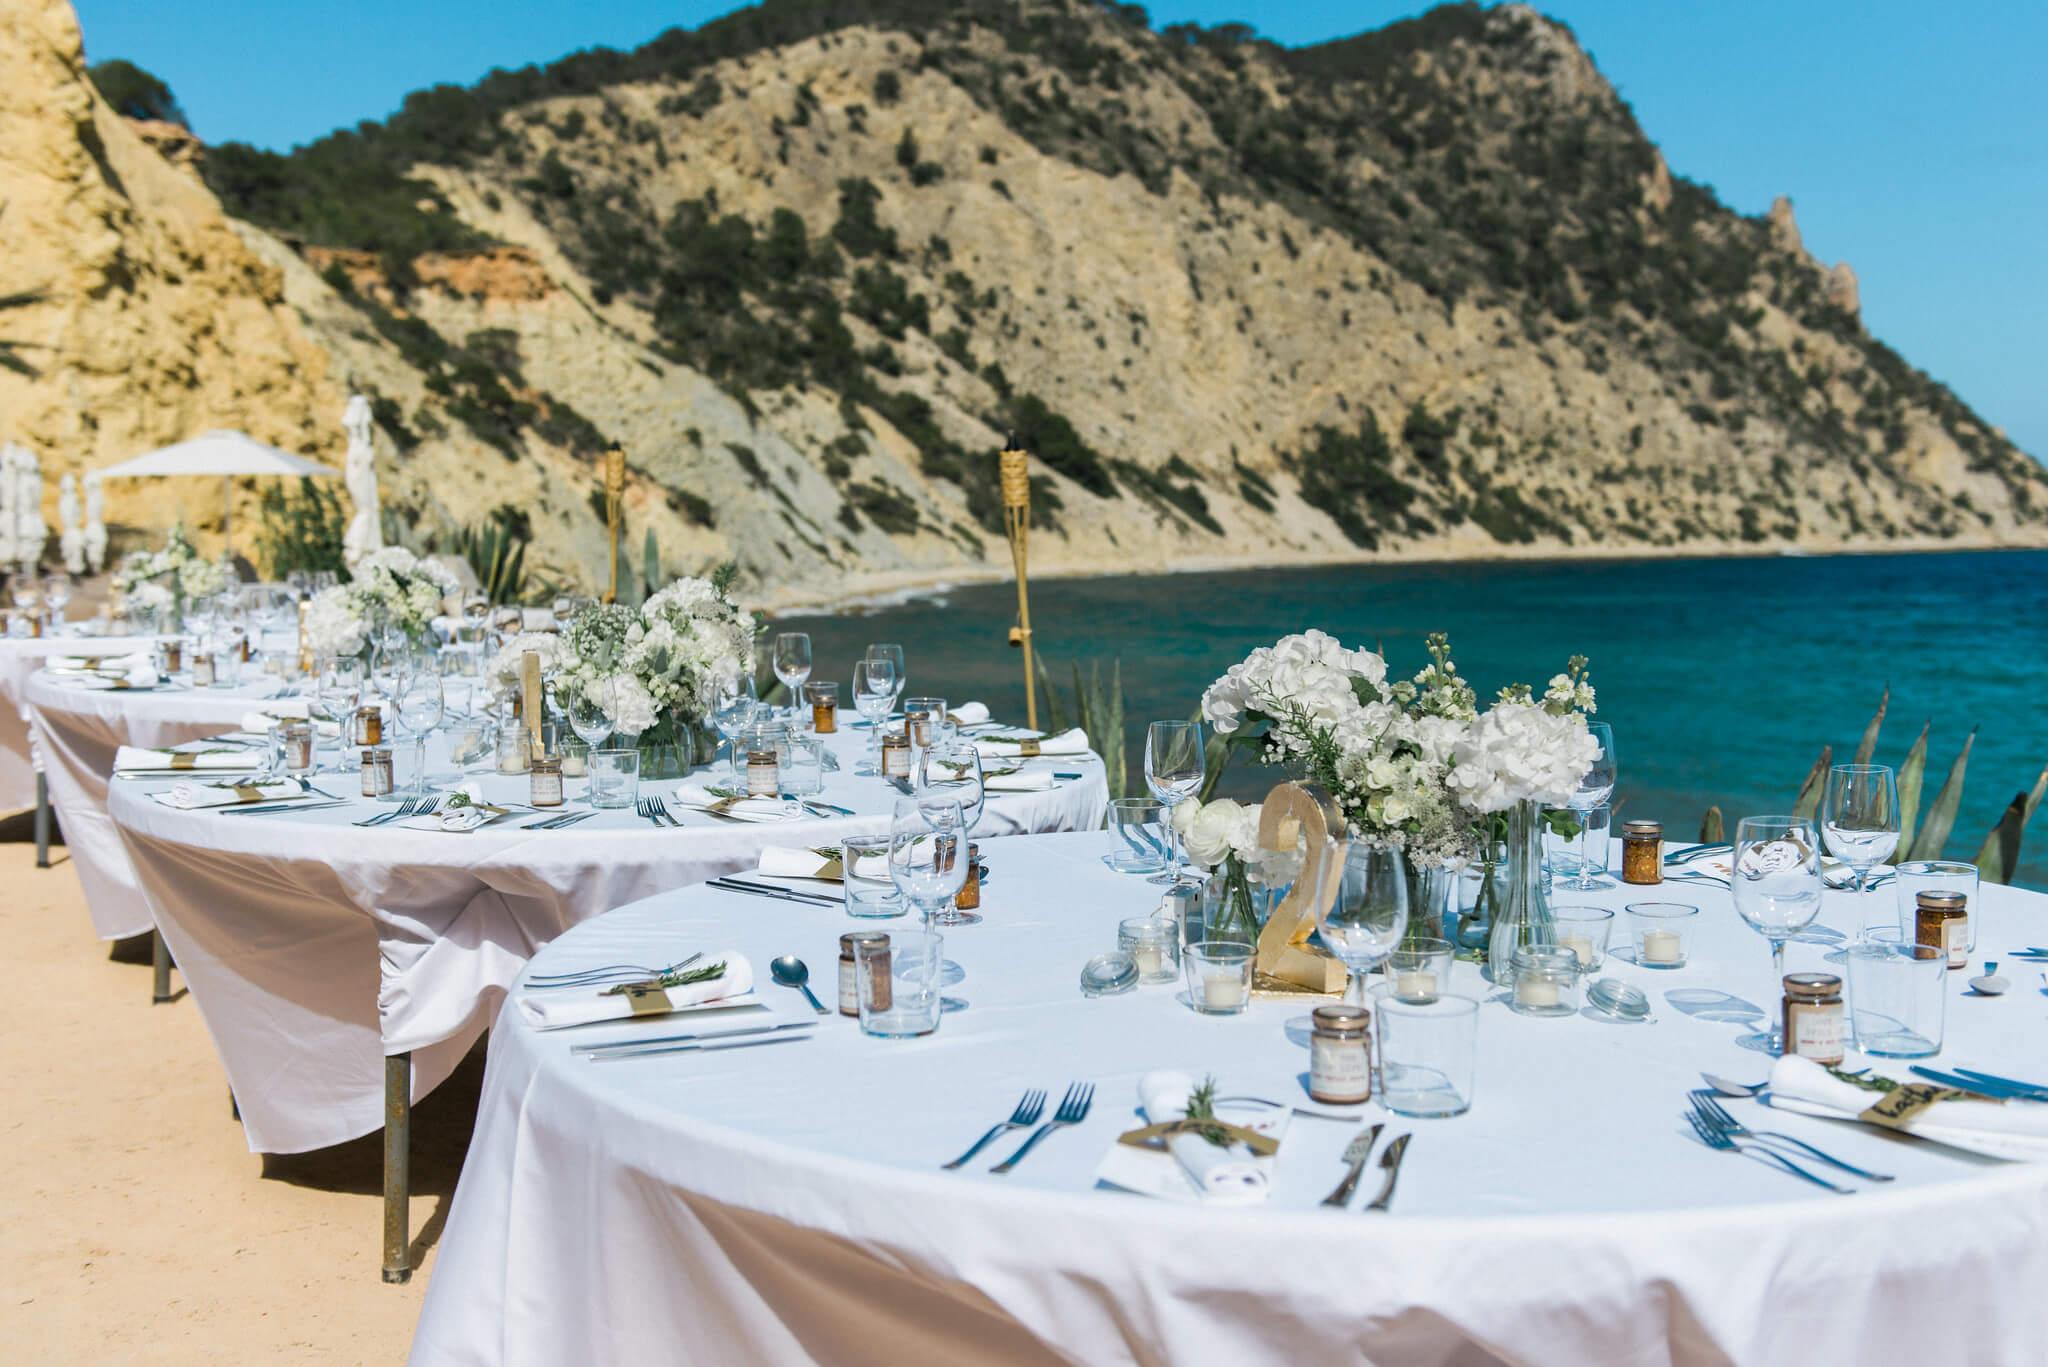 https://www.white-ibiza.com/wp-content/uploads/2020/03/ibiza-wedding-venues-amante-ibiza-2020-09.jpg